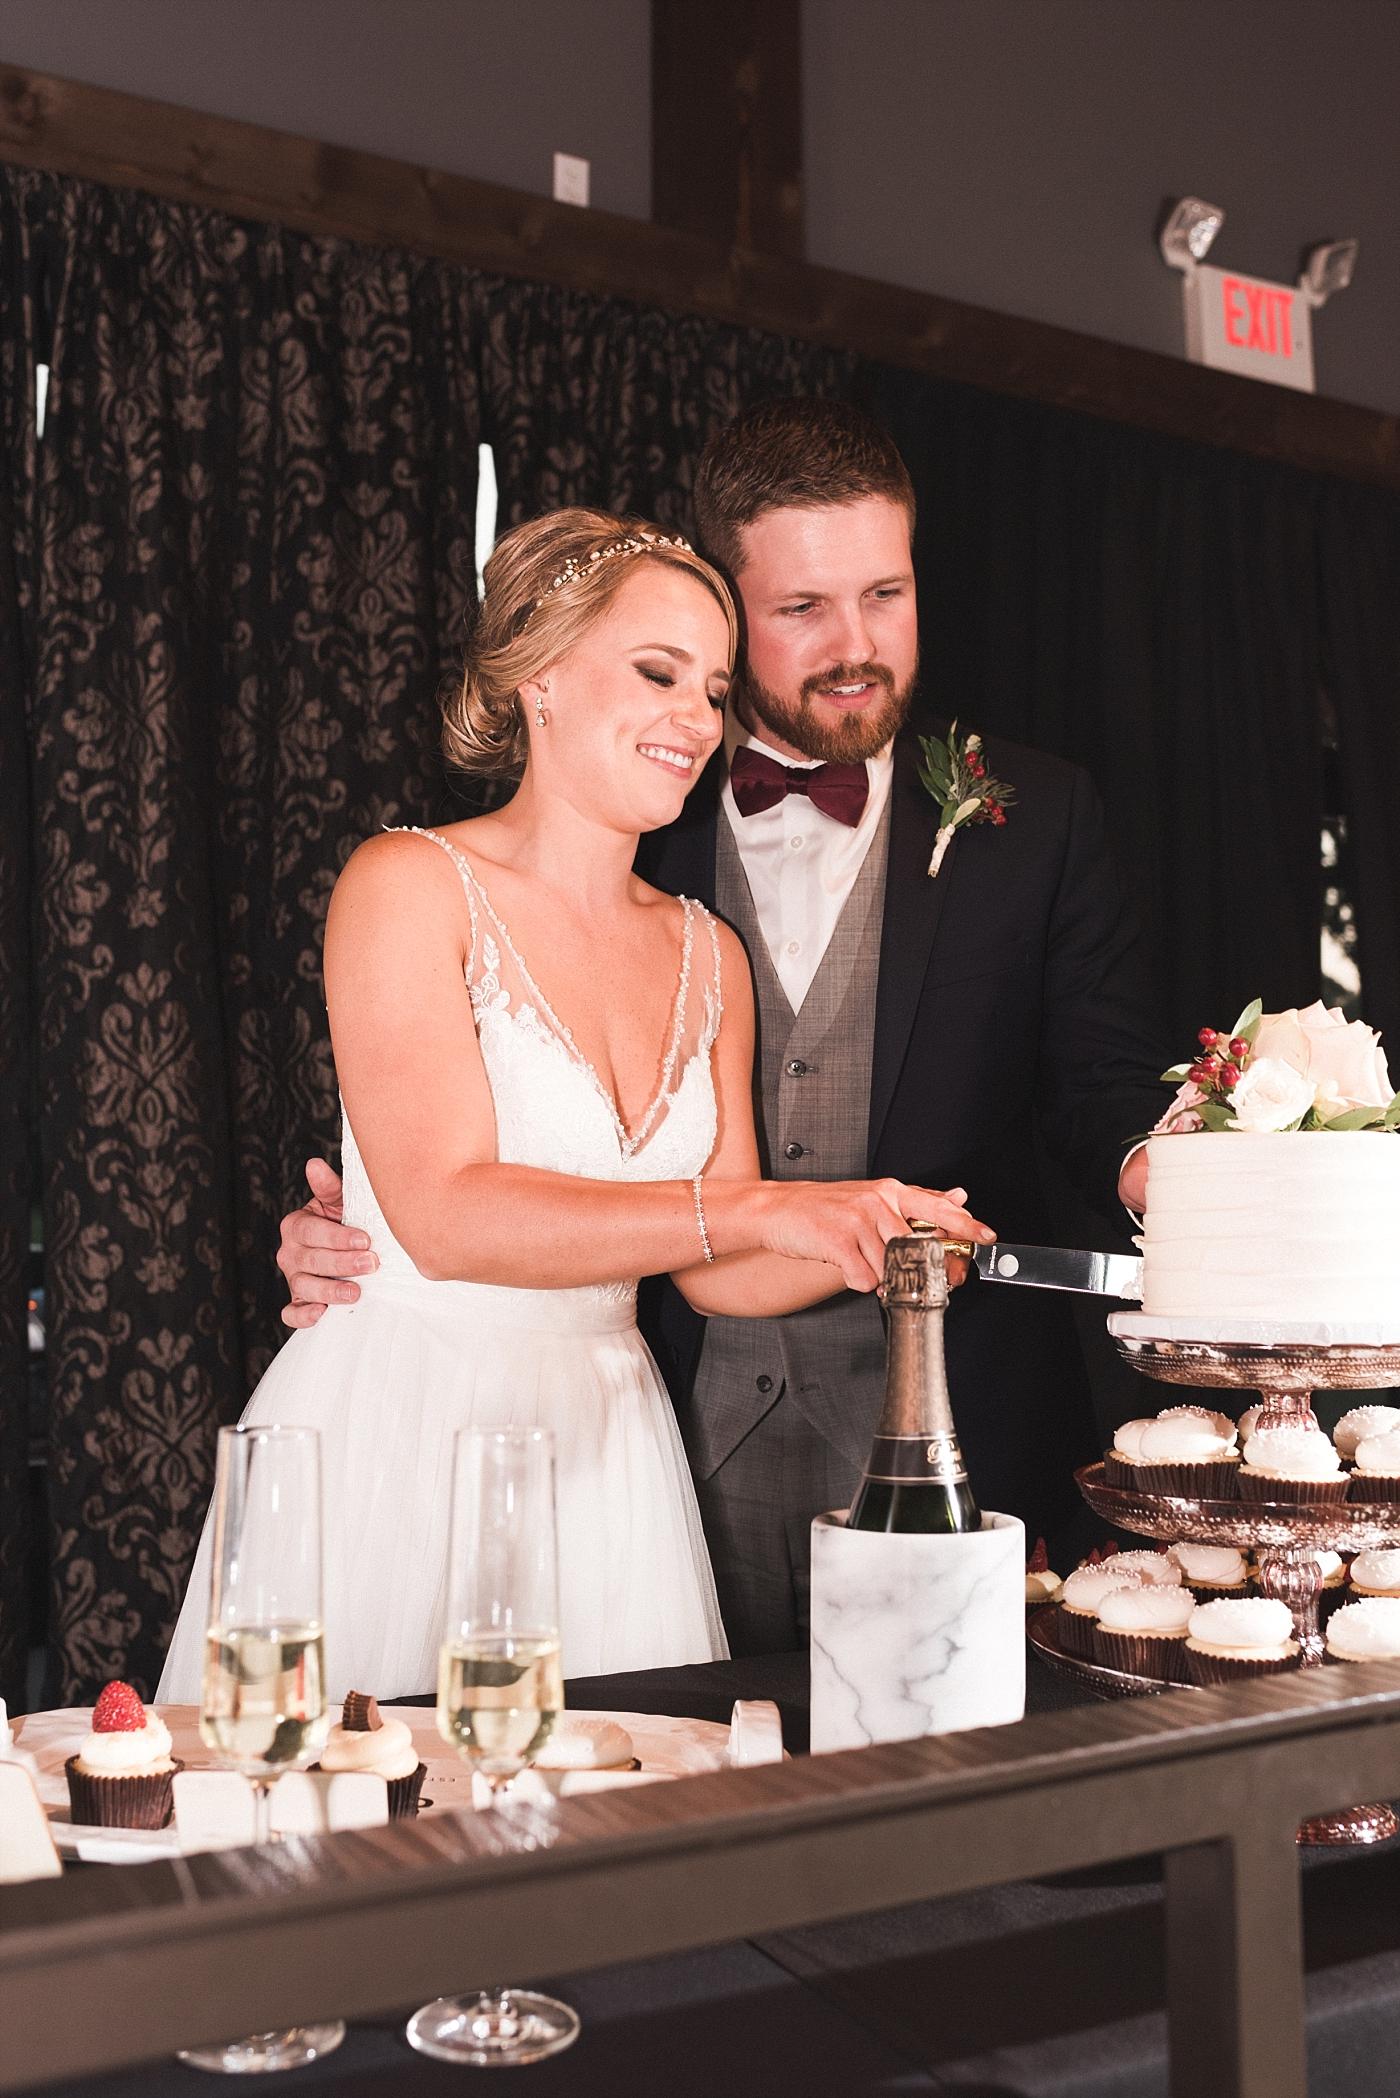 Bride groom Wedding photography reception cupcake dessert Wedding cake wedding details